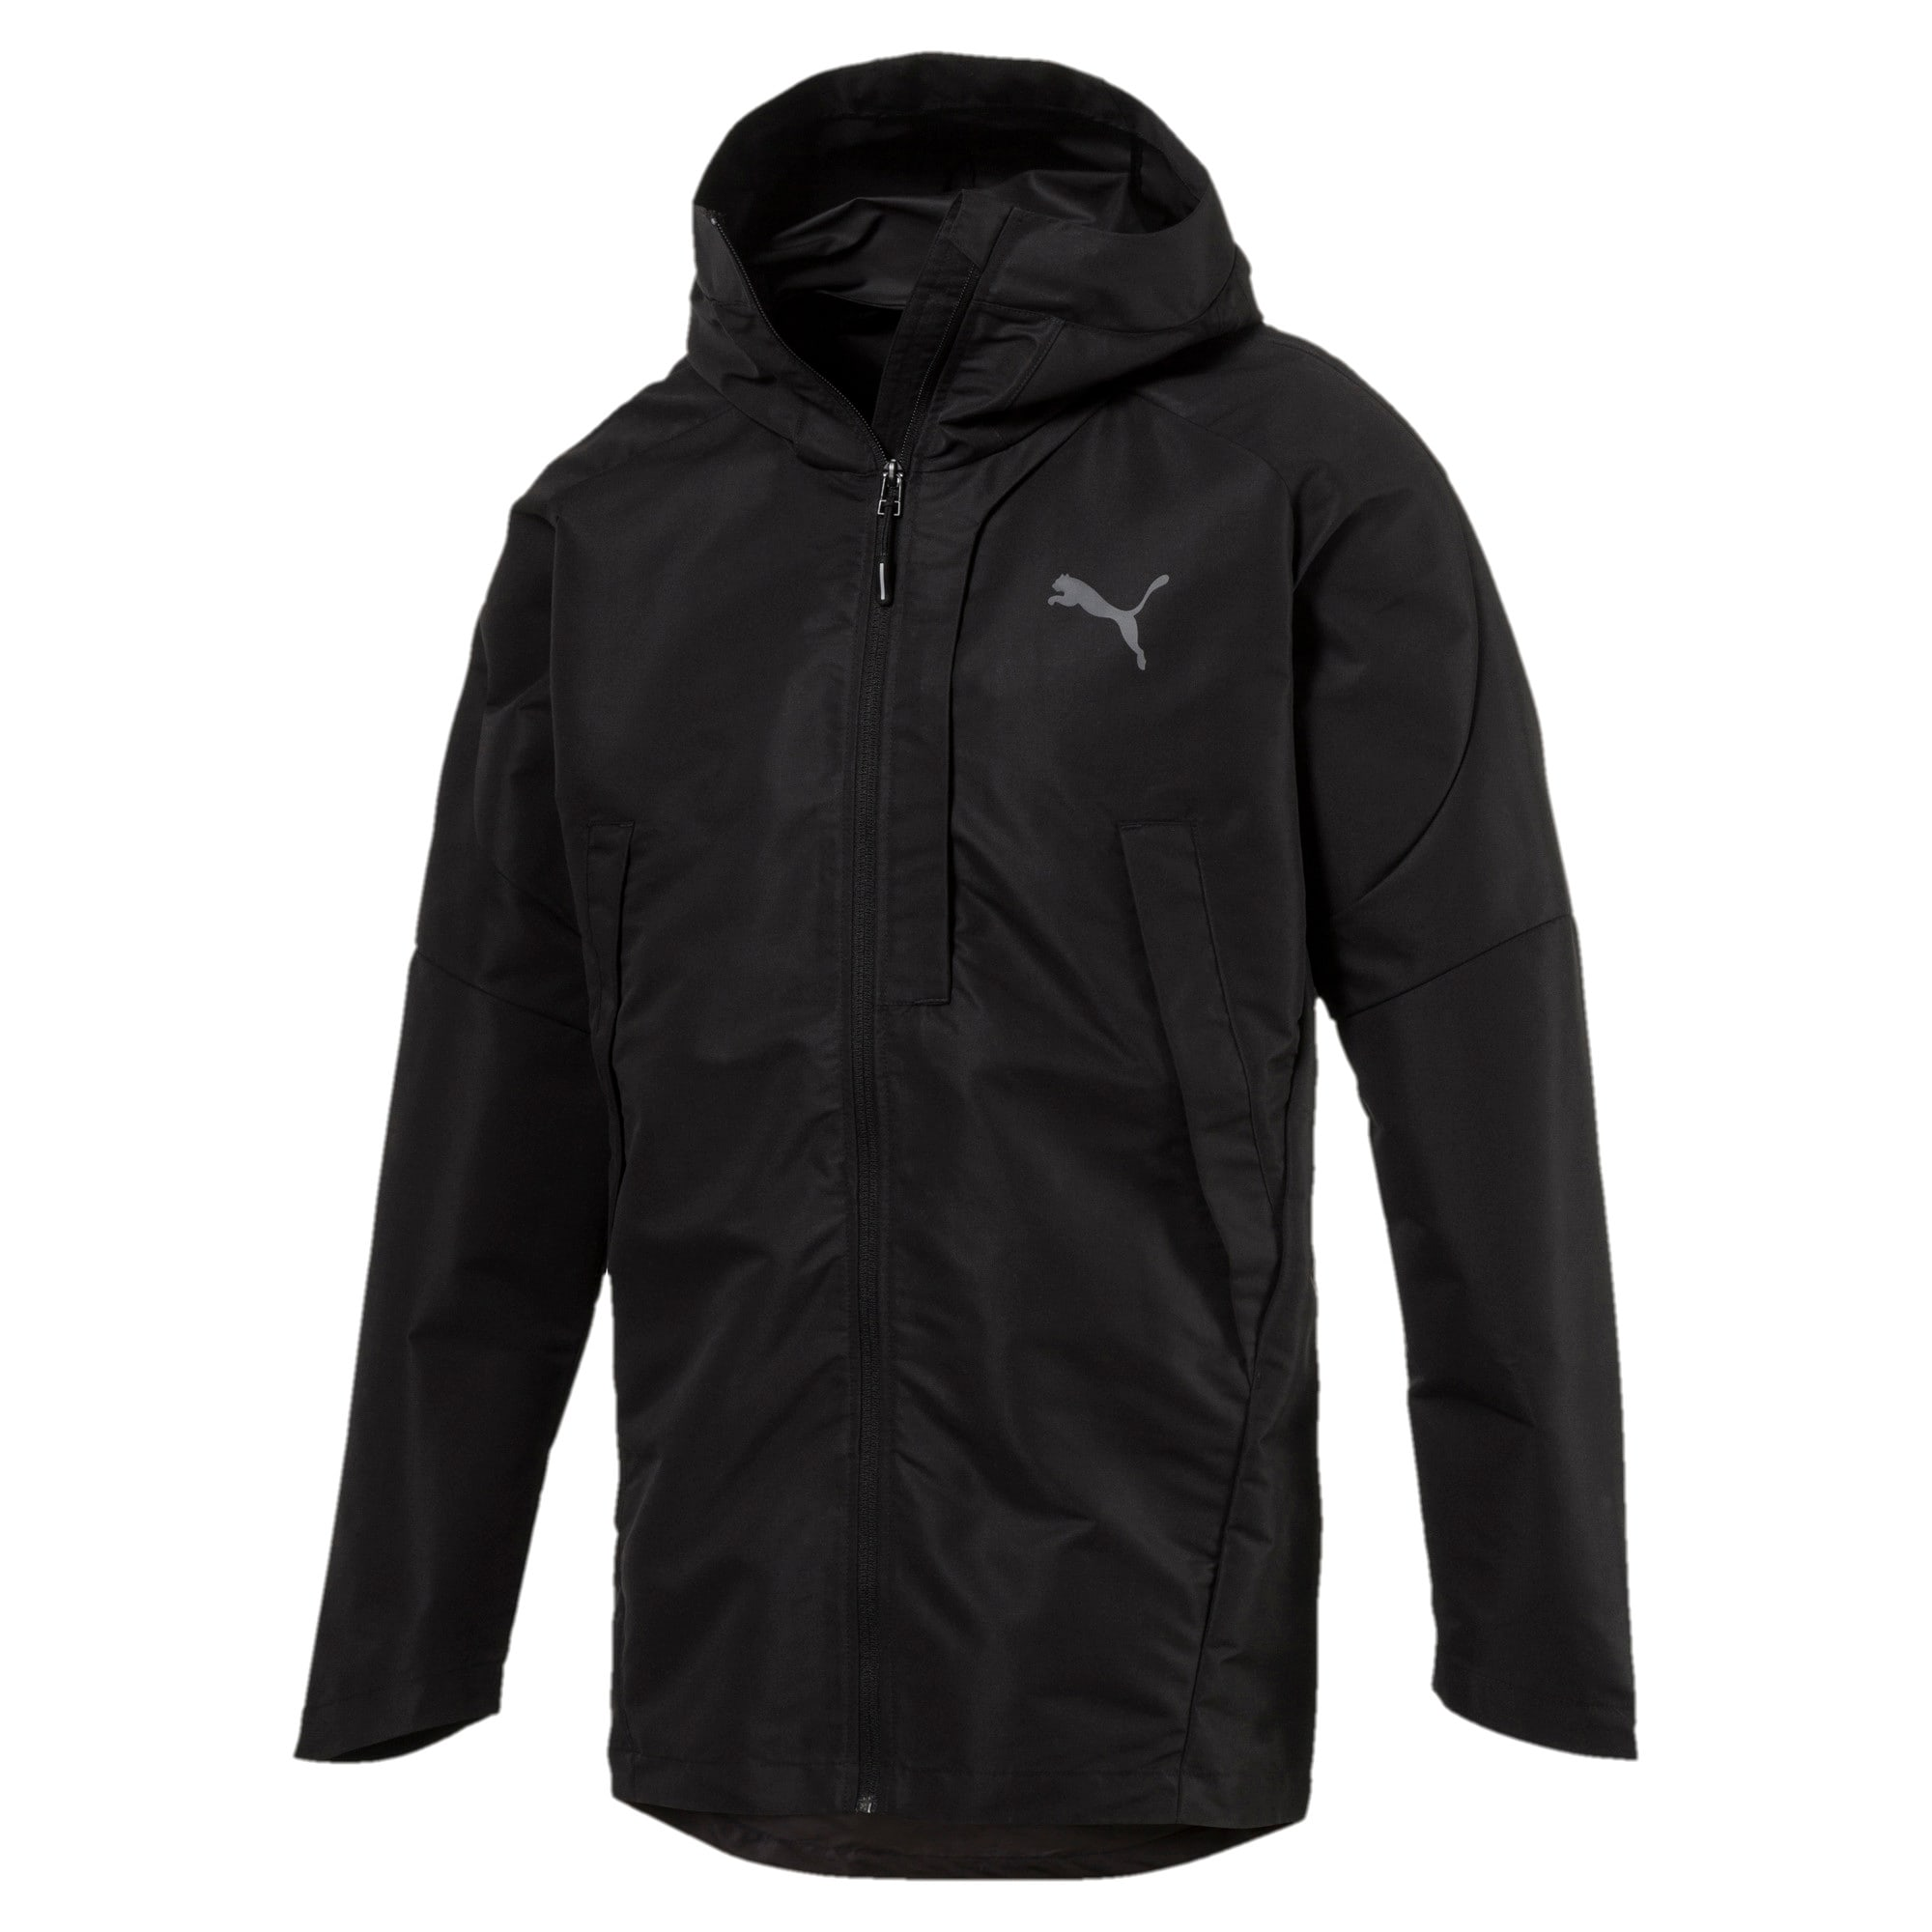 Thumbnail 1 of Mobility Men's Jacket, Puma Black, medium